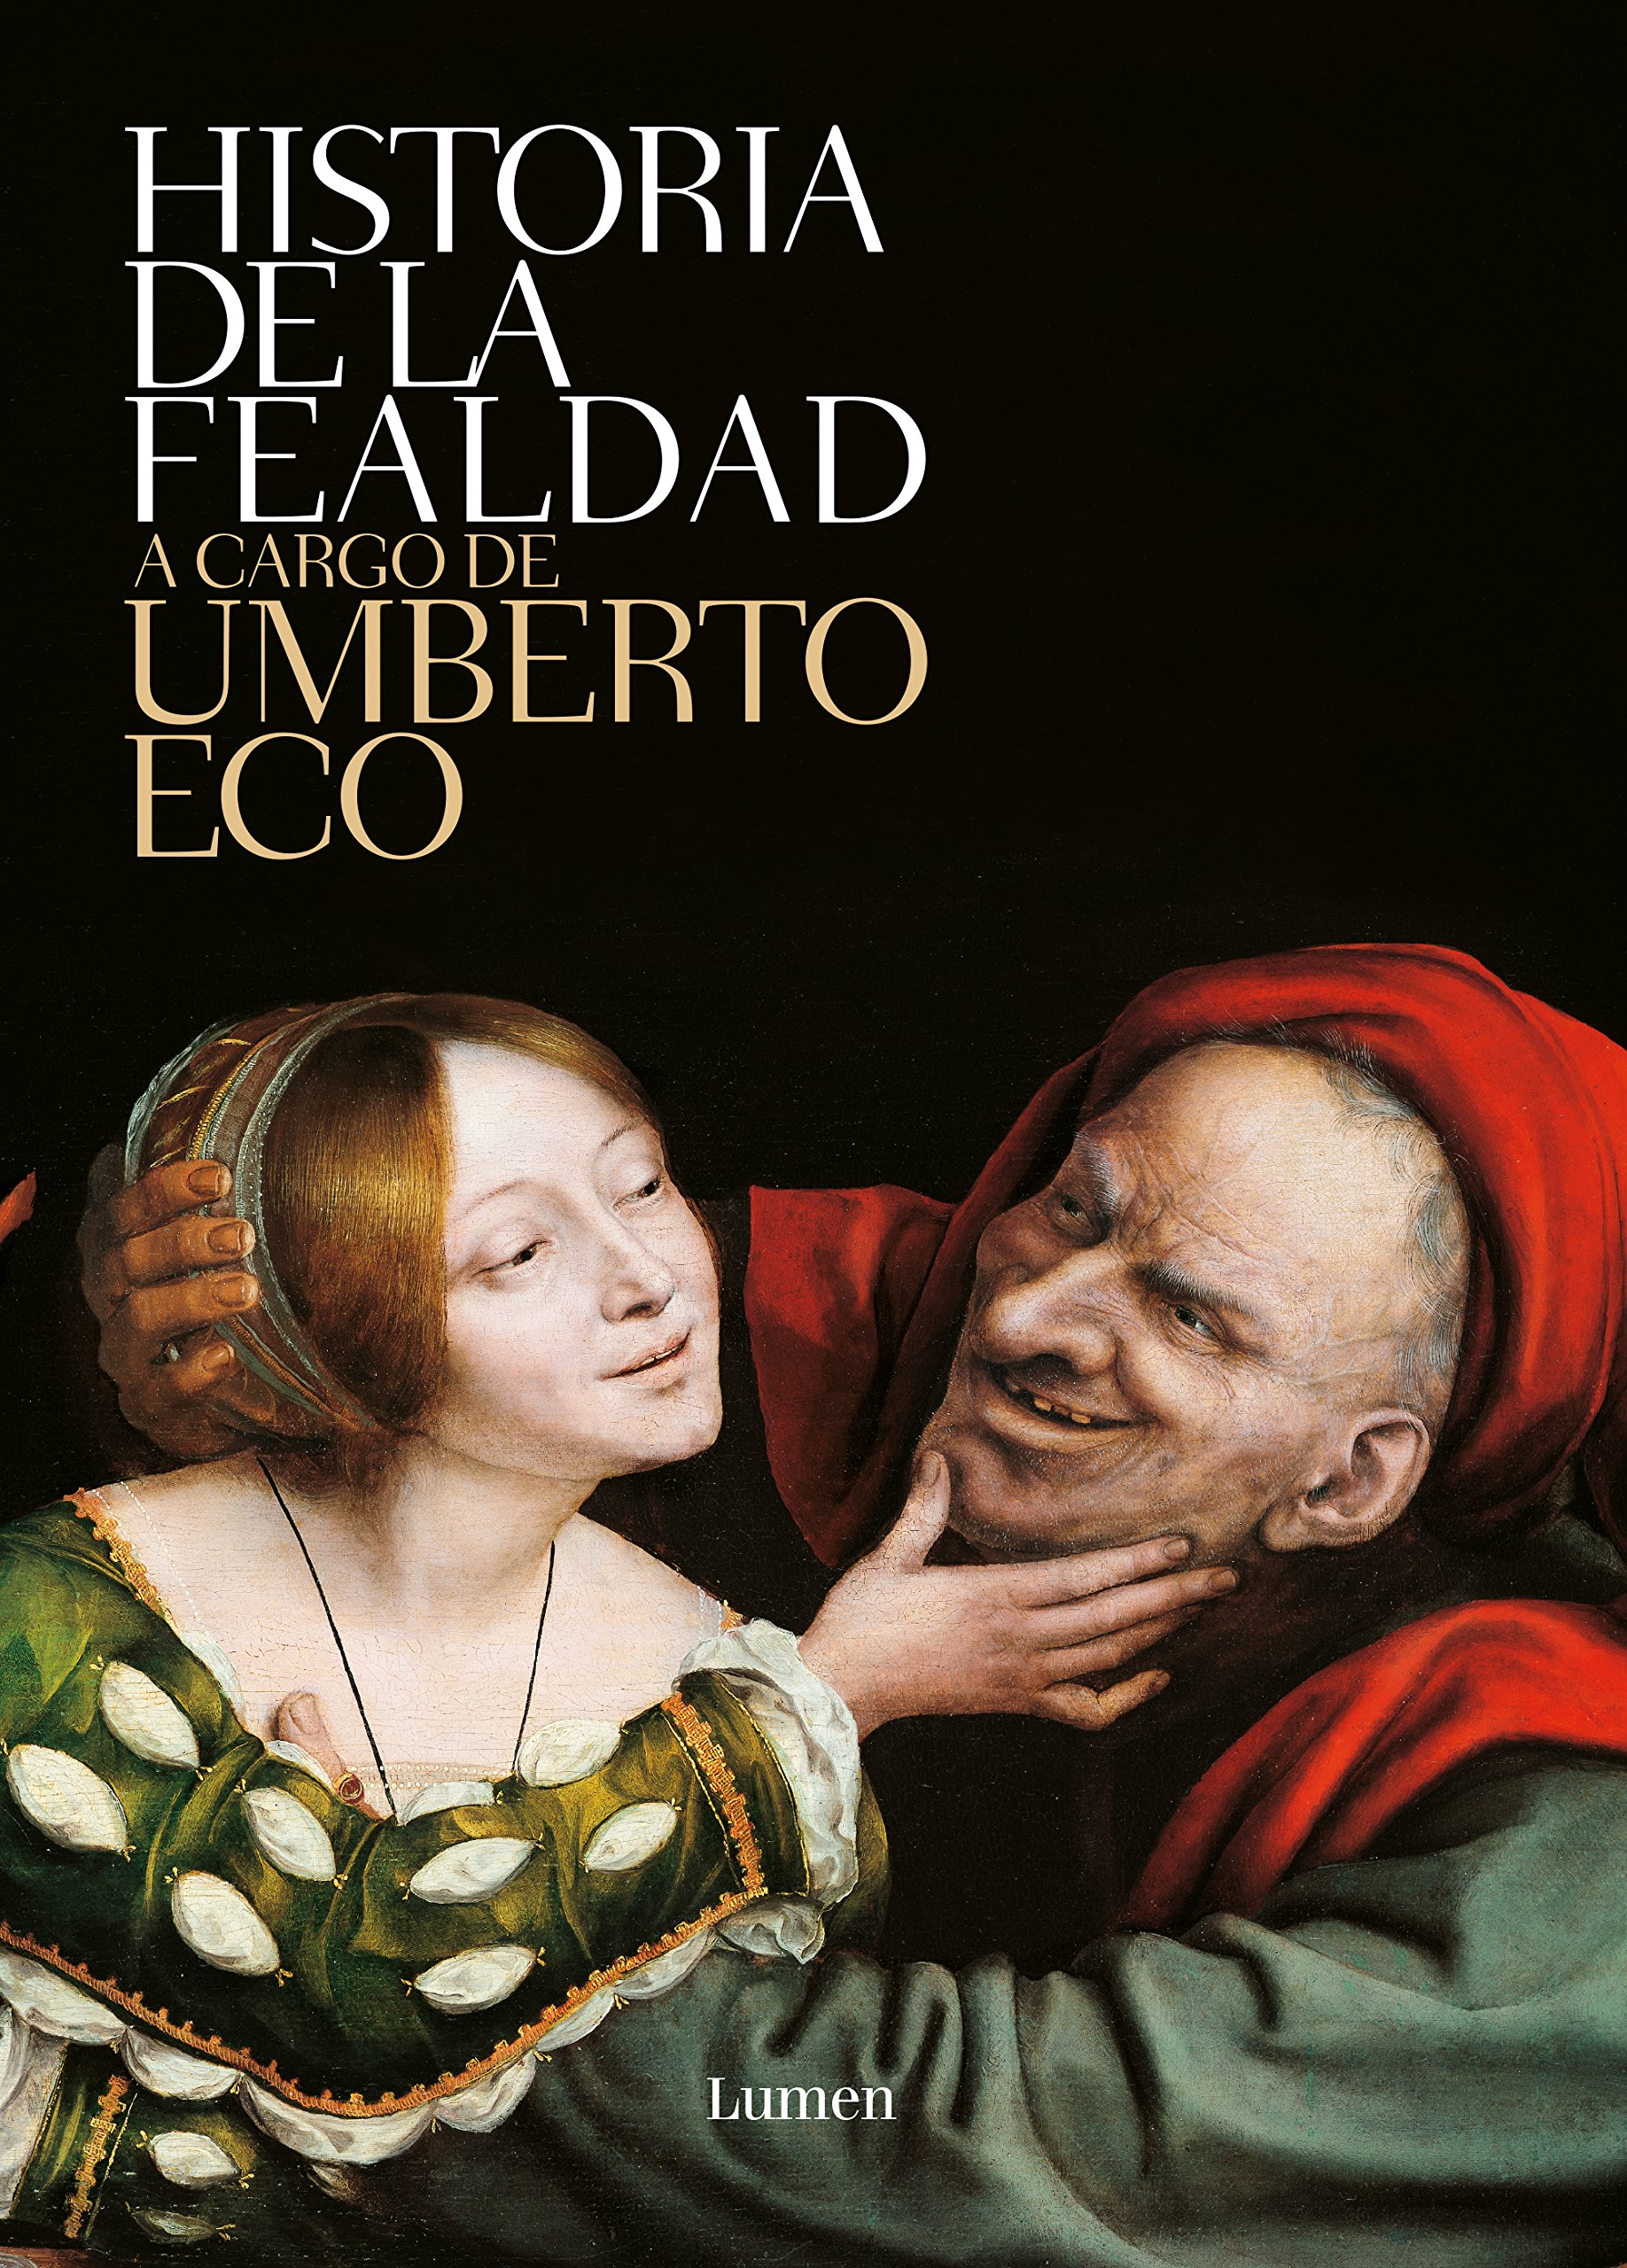 Historia de la fealdad / History of Ugliness (Spanish Edition) PDF